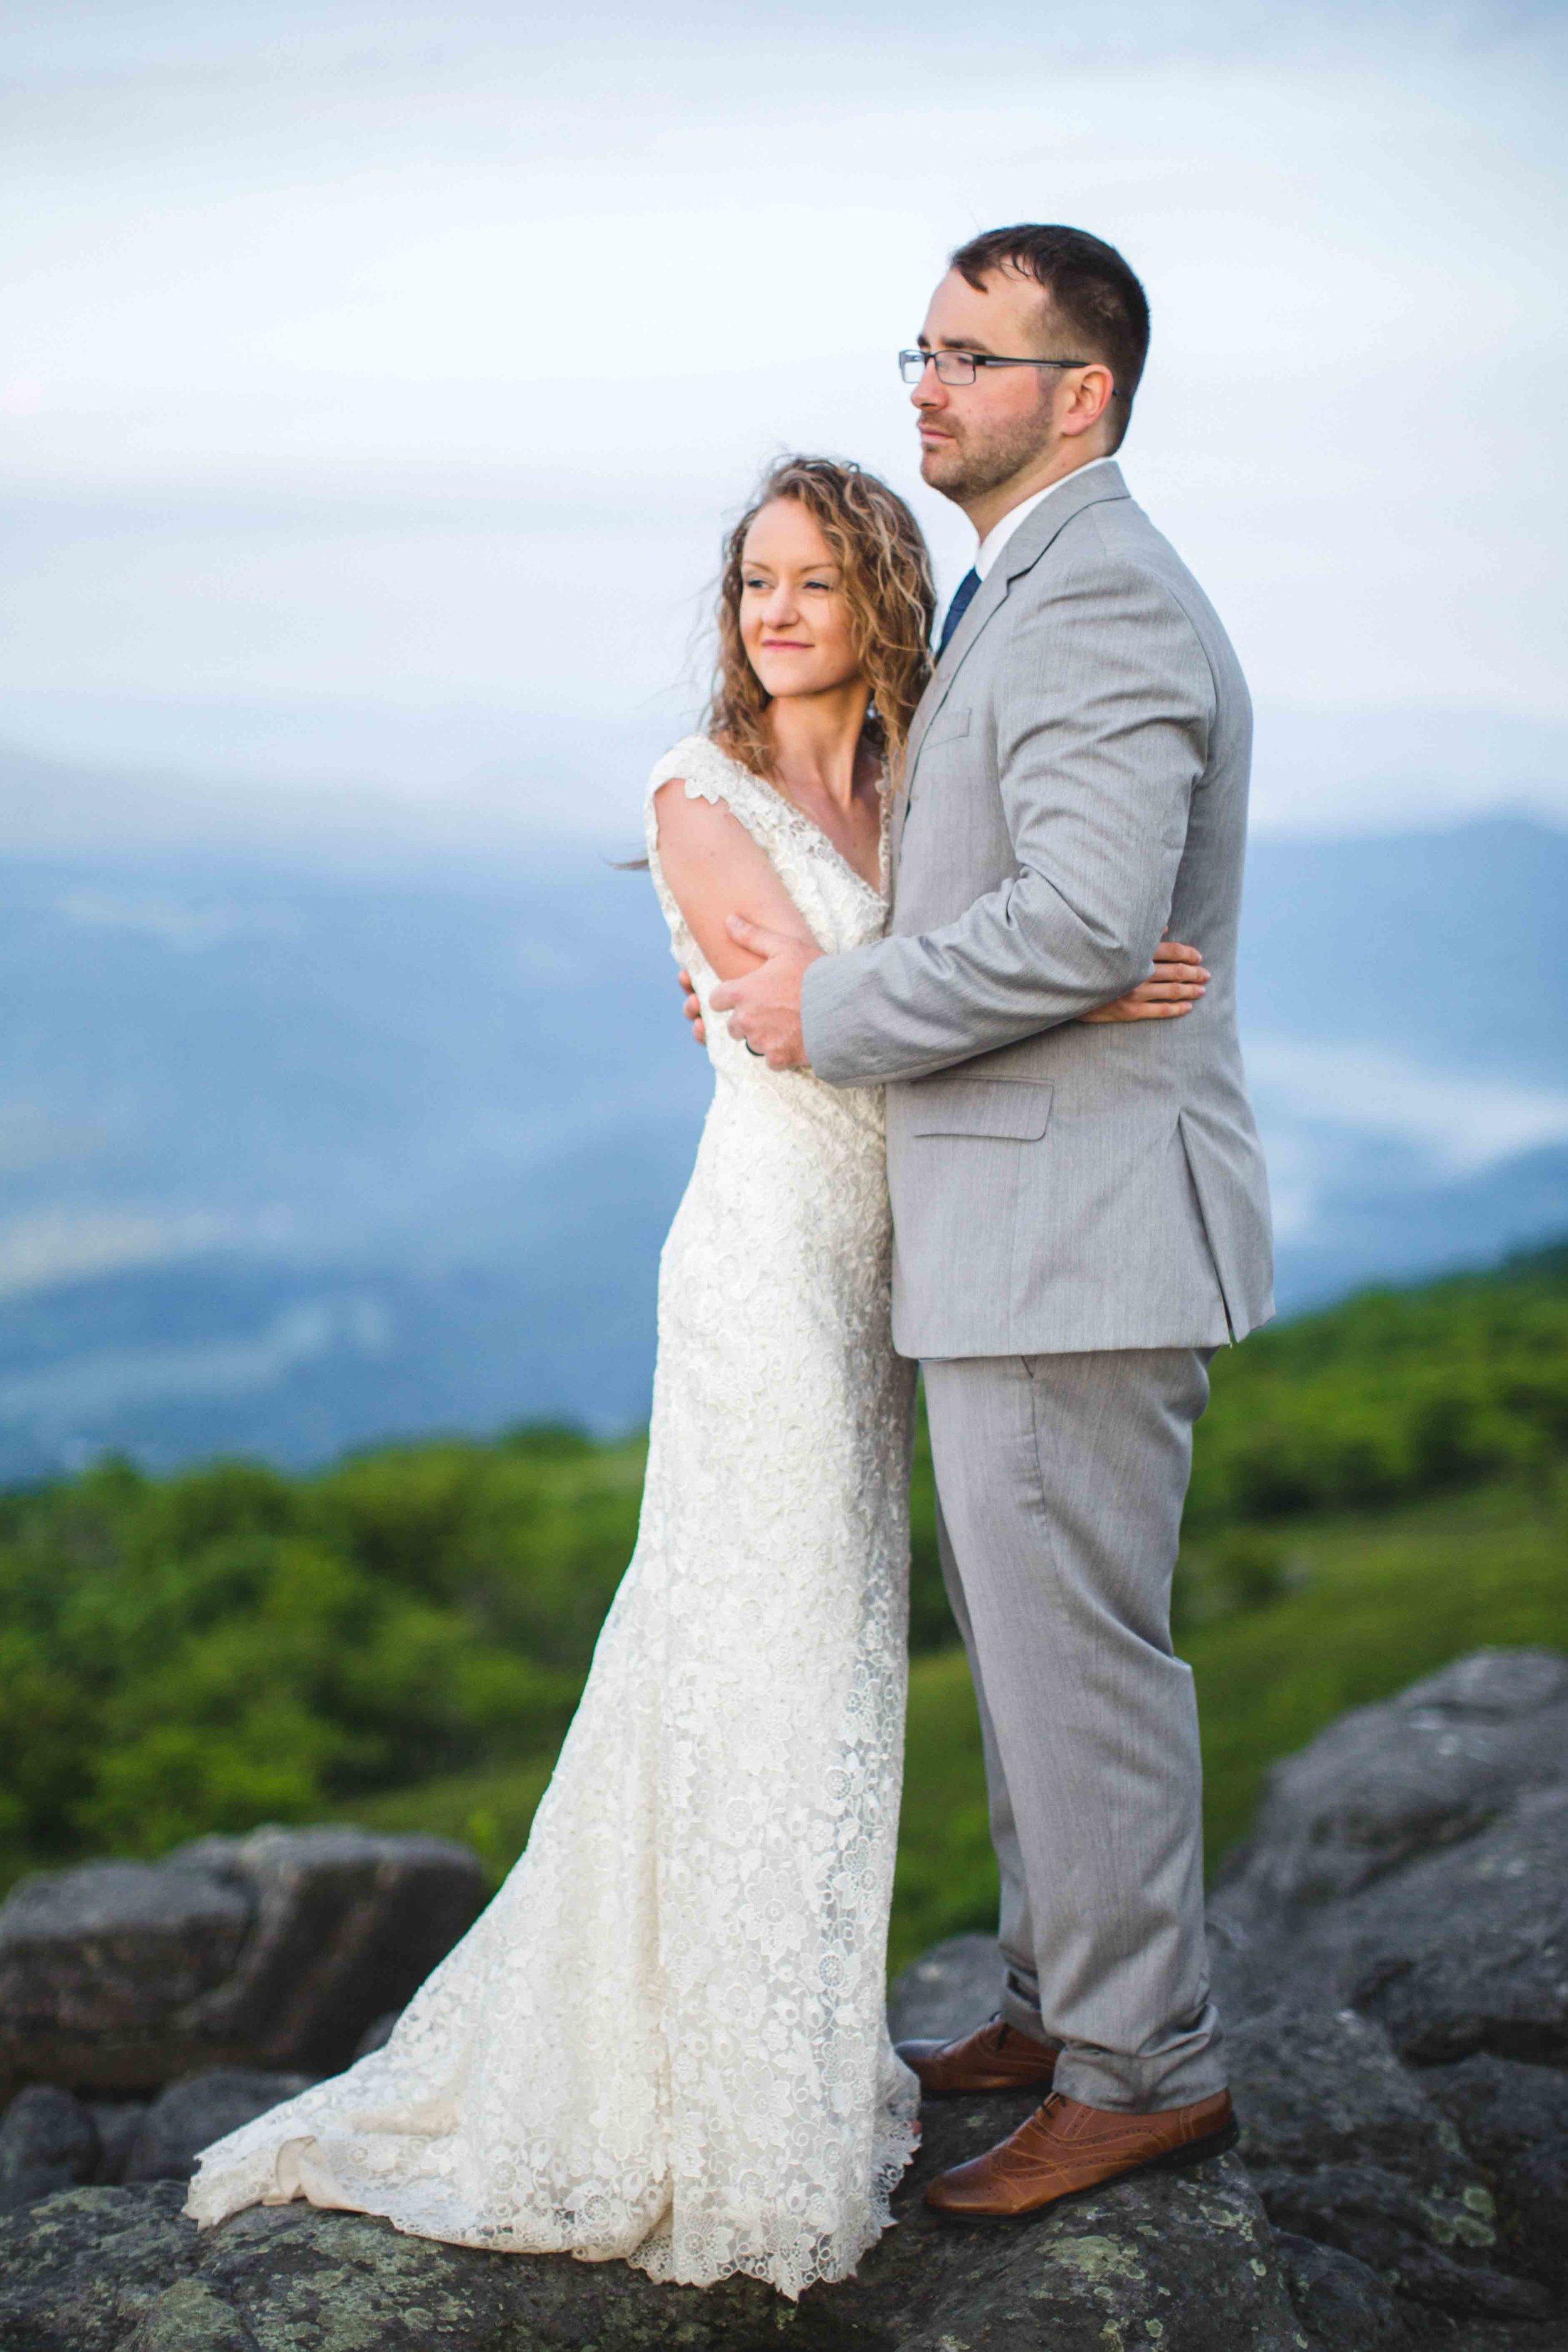 north-carolina-elopement-photographer-83.jpg